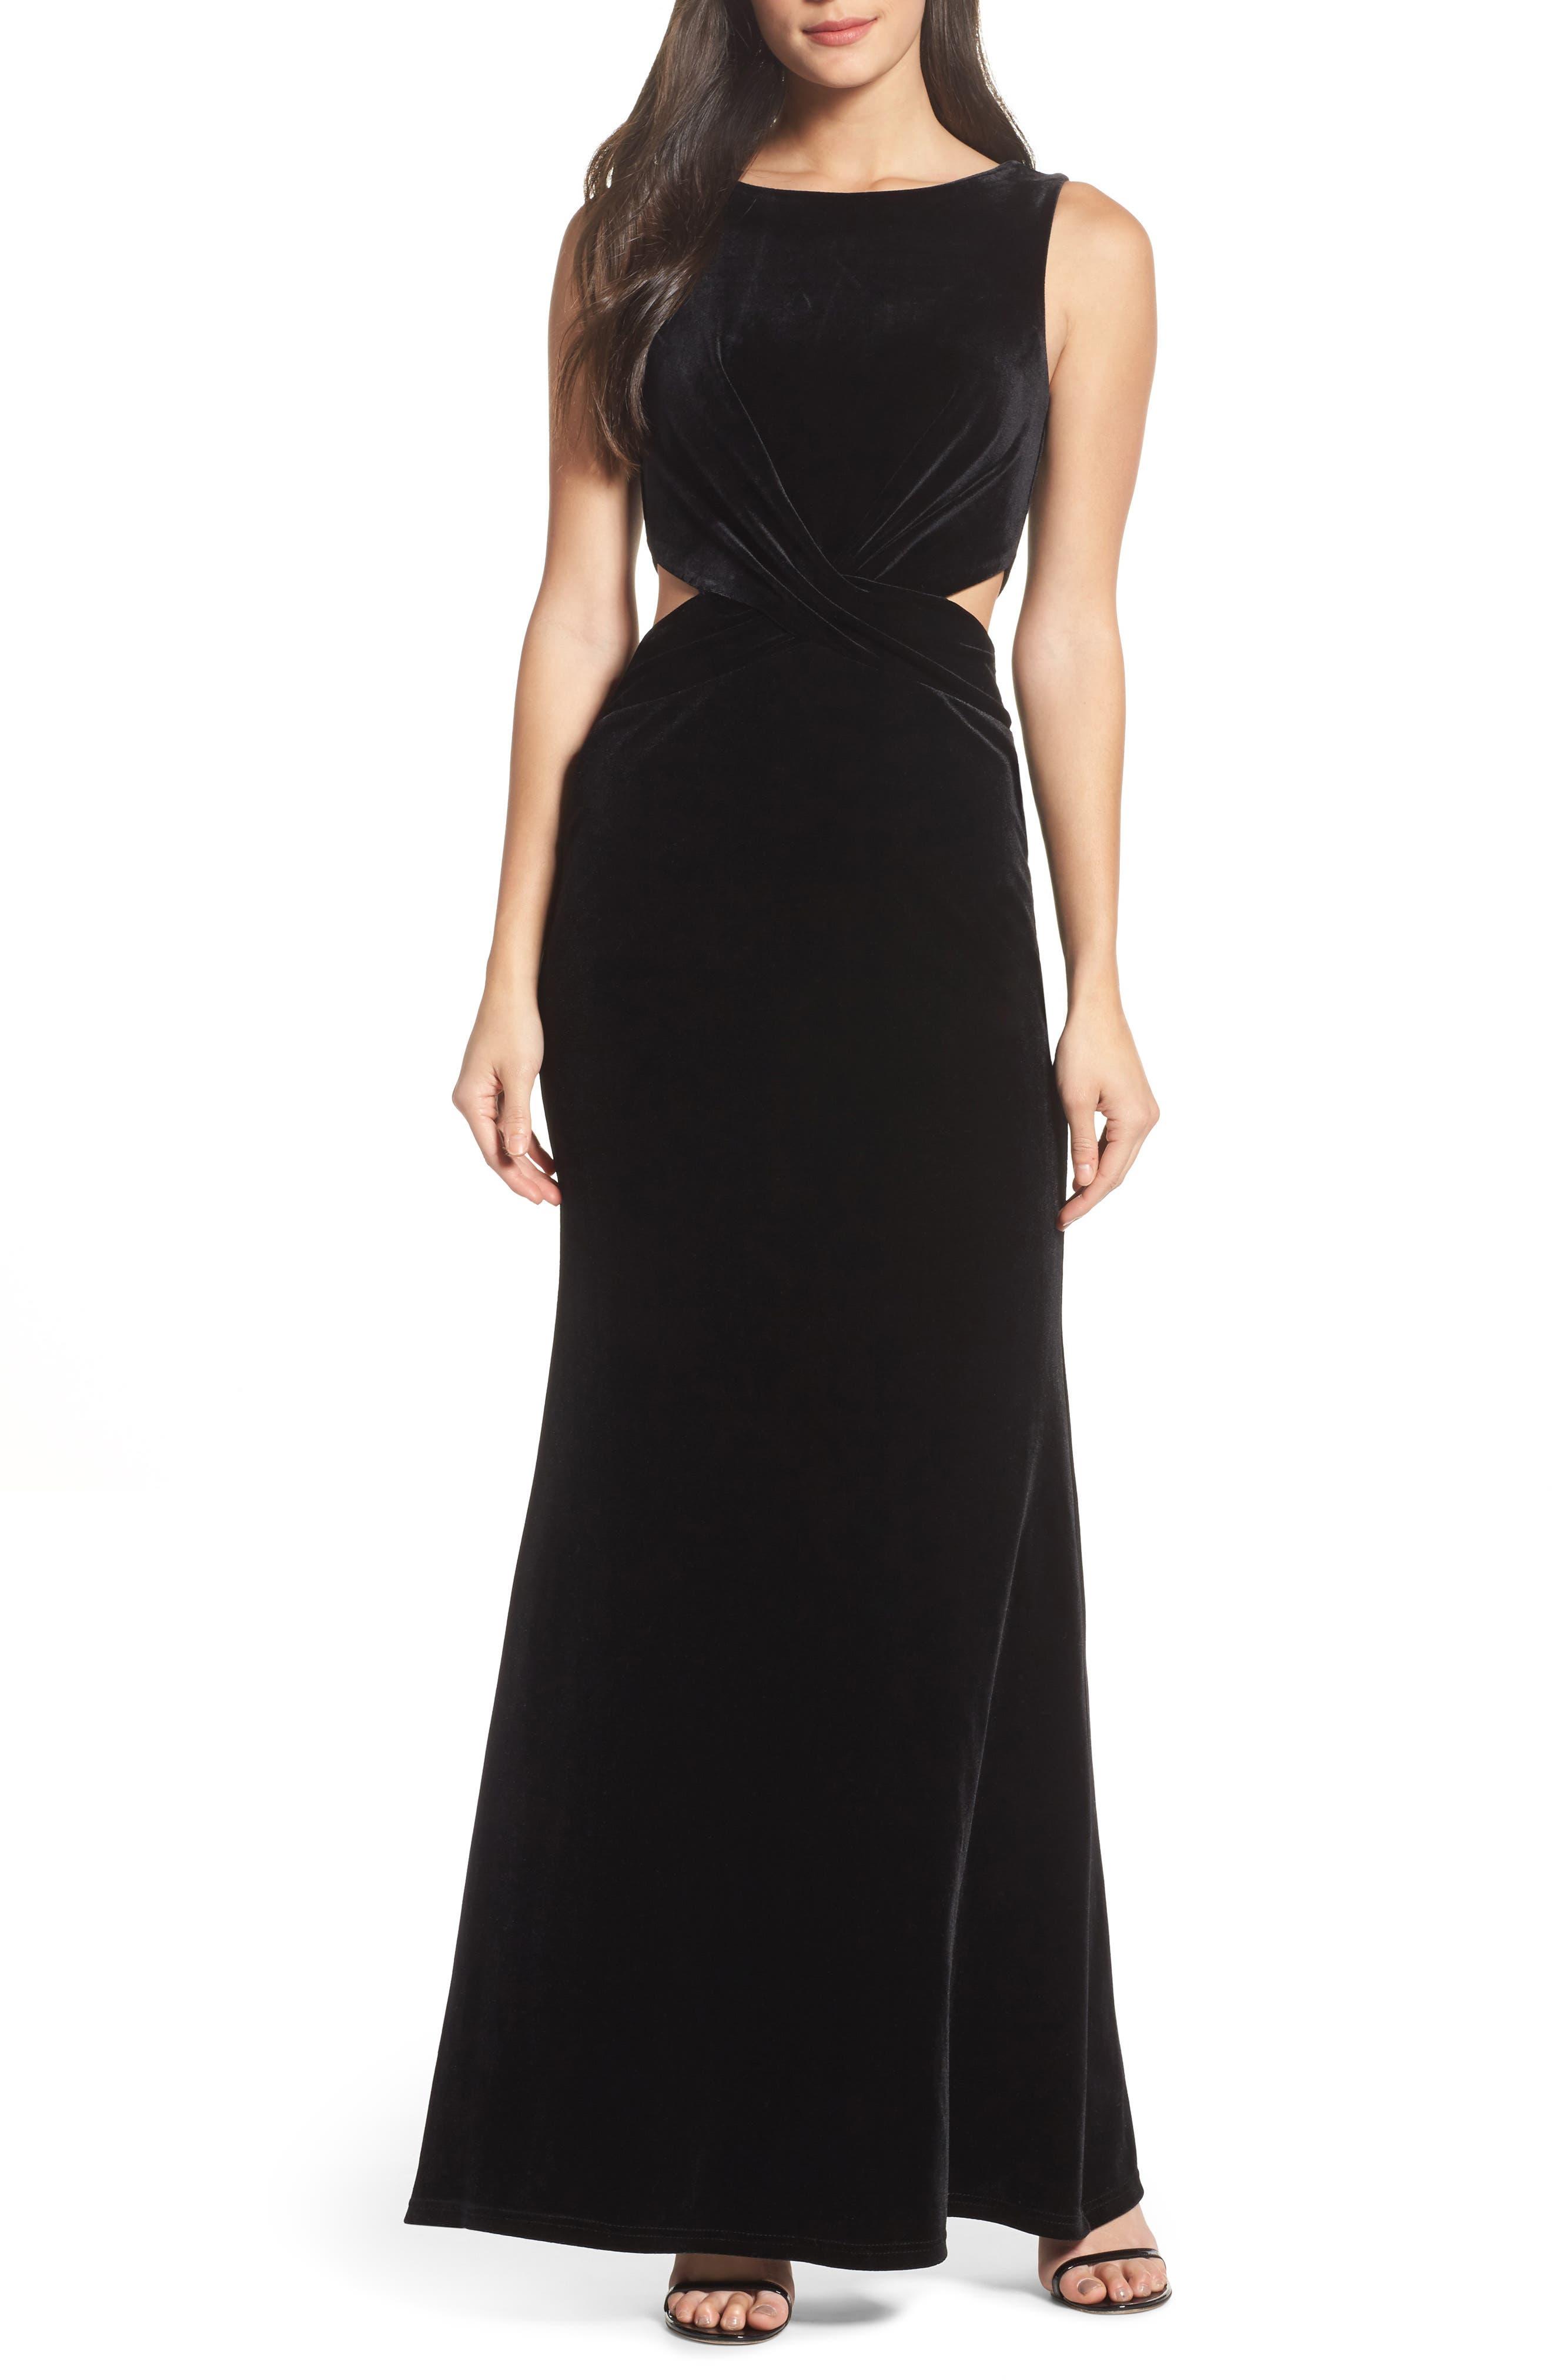 Lulus Reach Out Velvet Maxi Dress